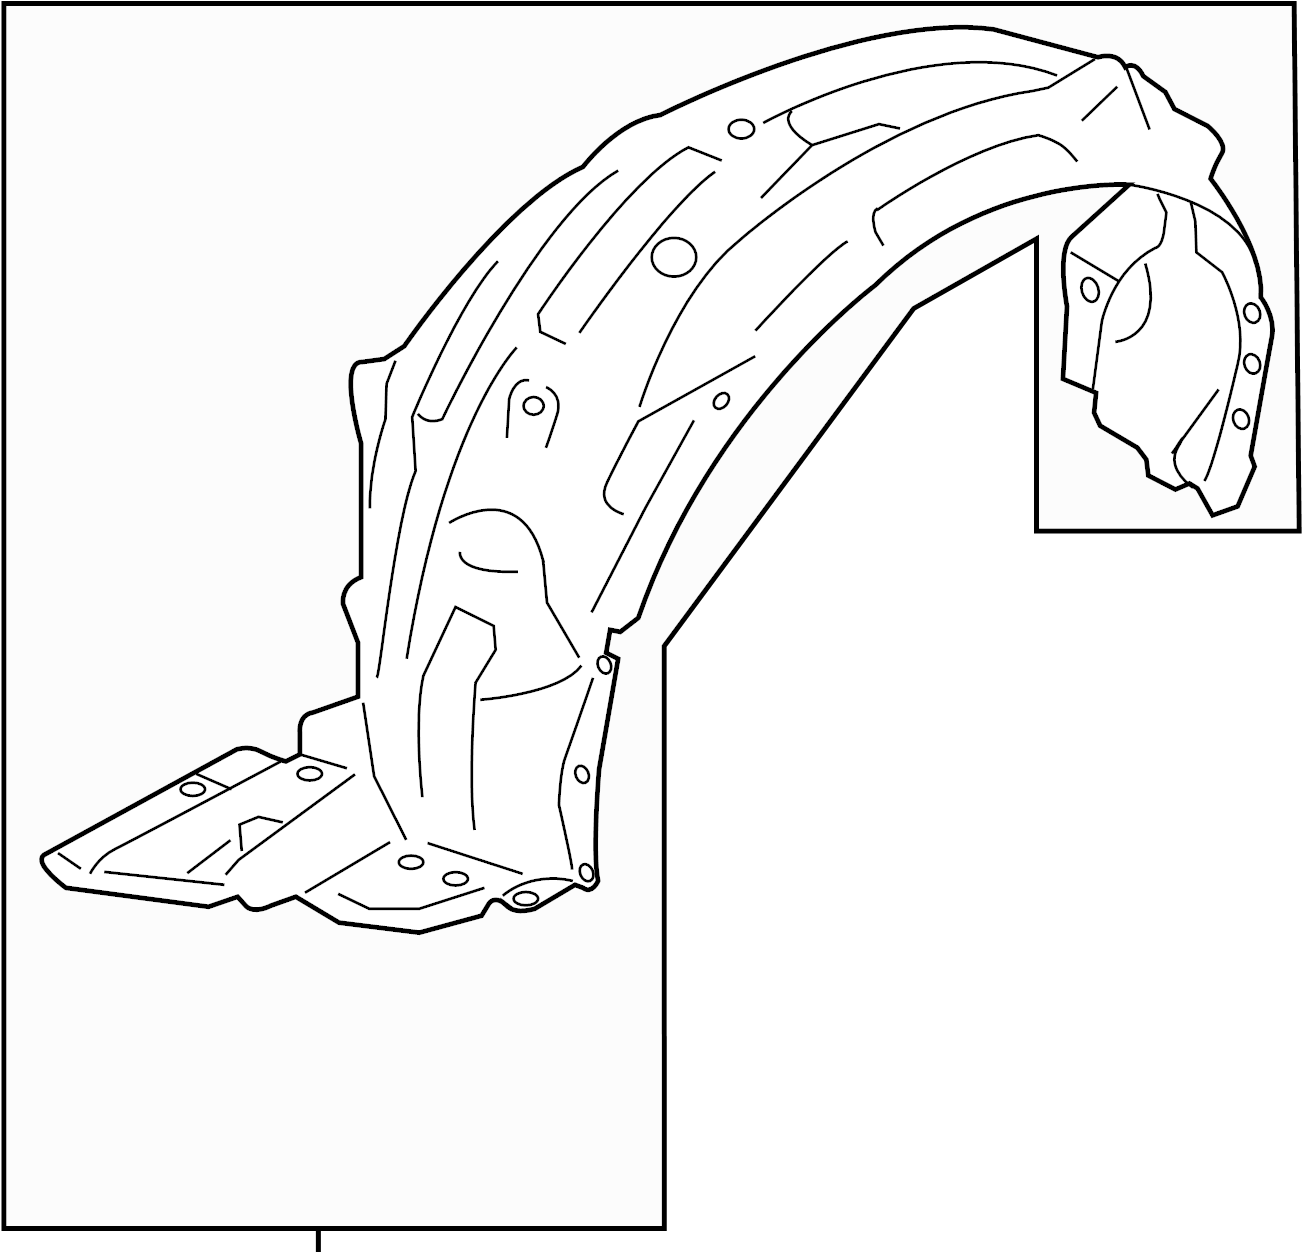 Scion Fr S Fender Splash Shield Left Front Rear